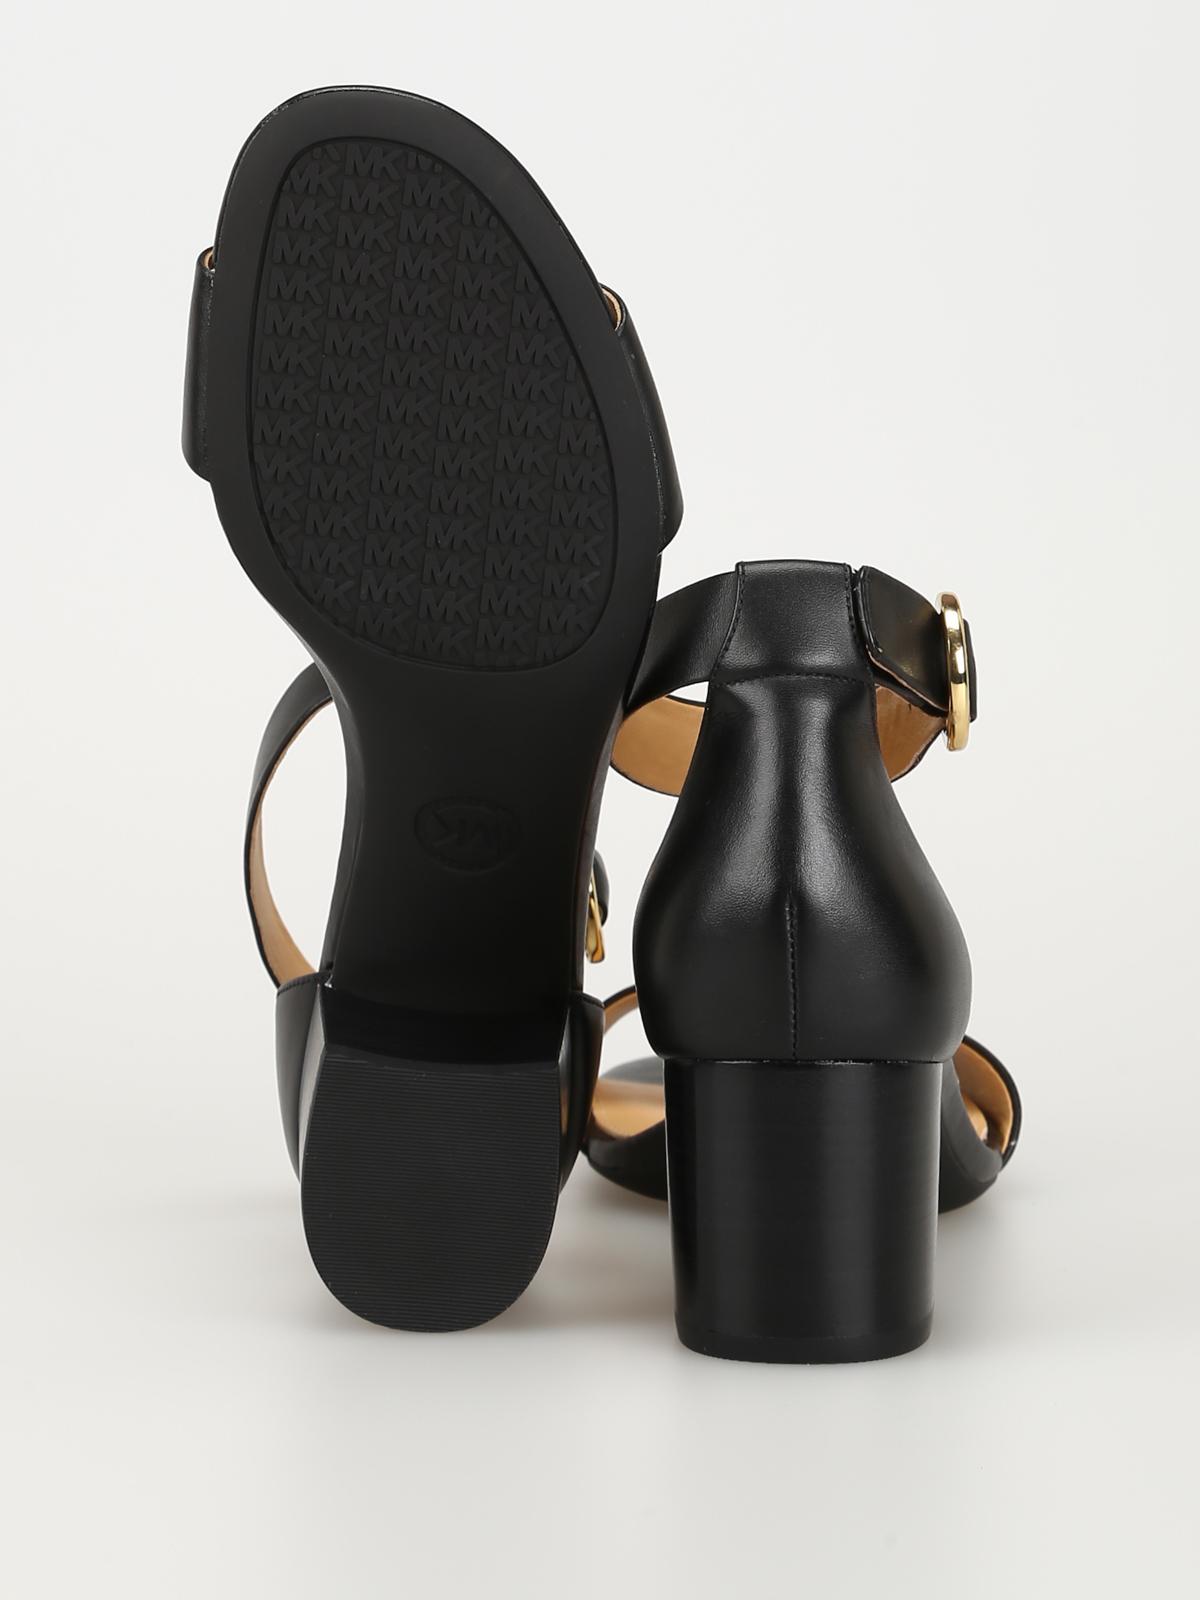 Michael Kors - Lena Flex black leather